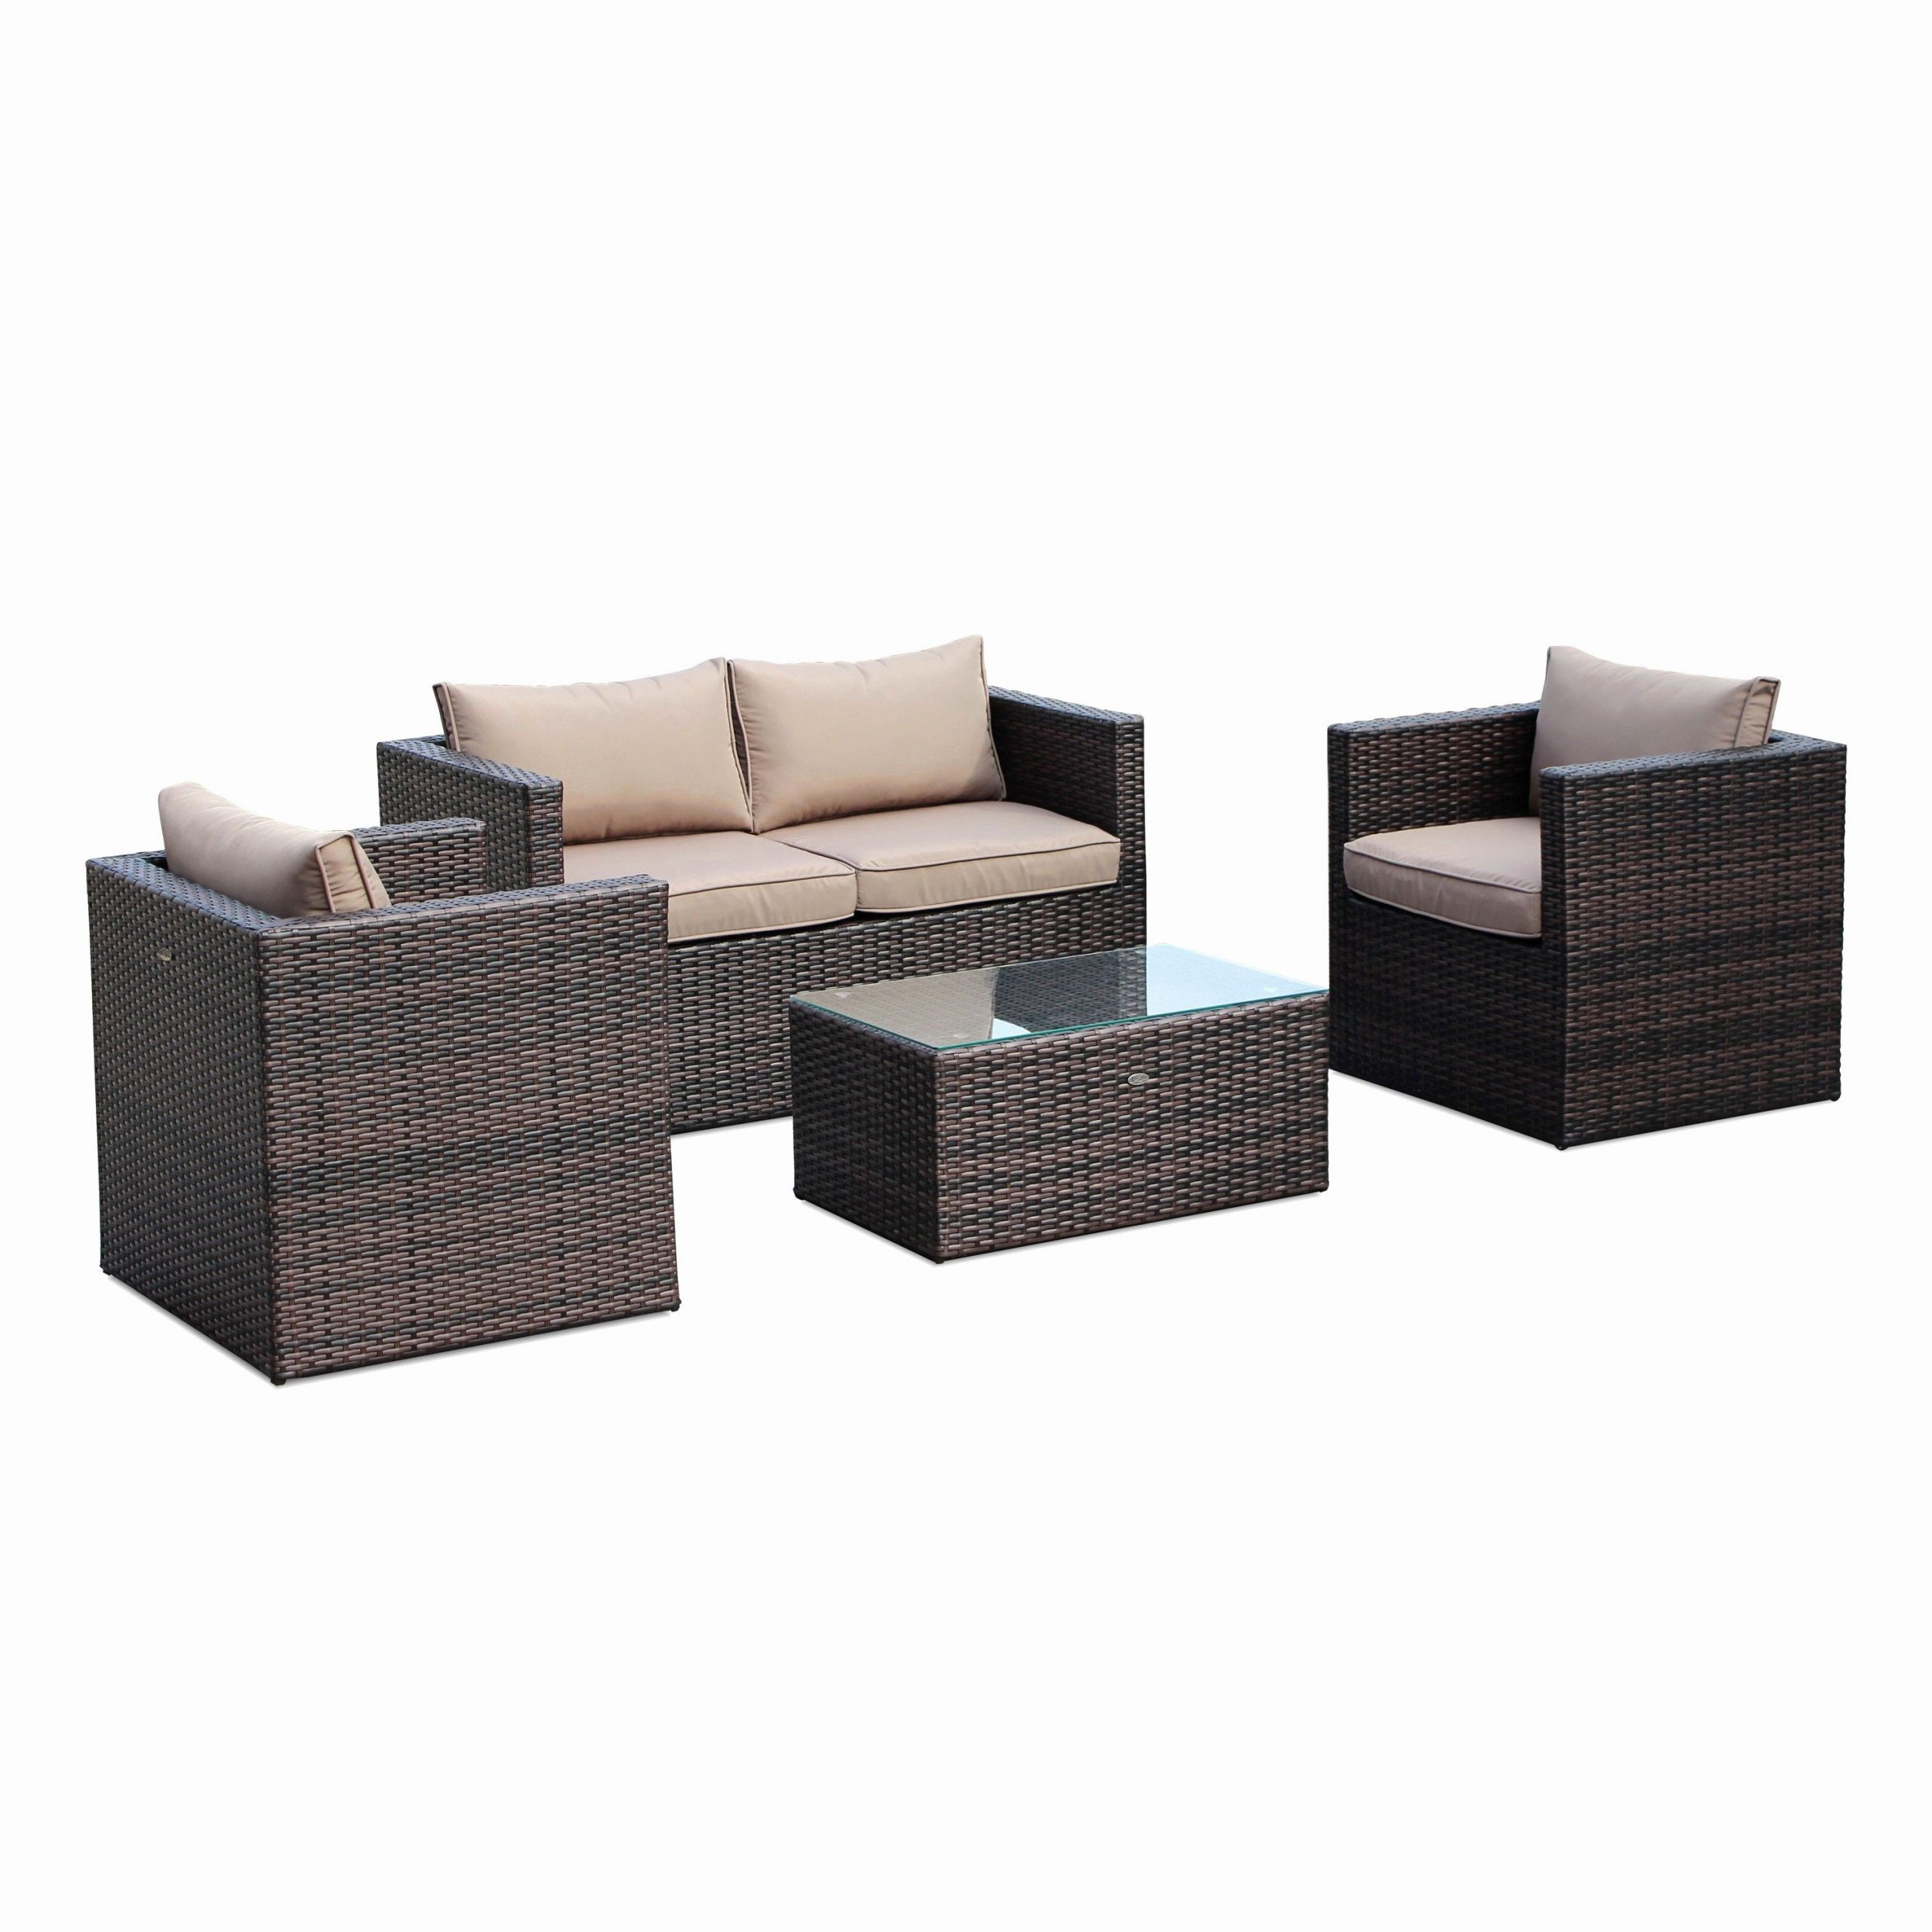 meuble console i i table jardin charmant meuble toilette i i meuble de of meuble console i